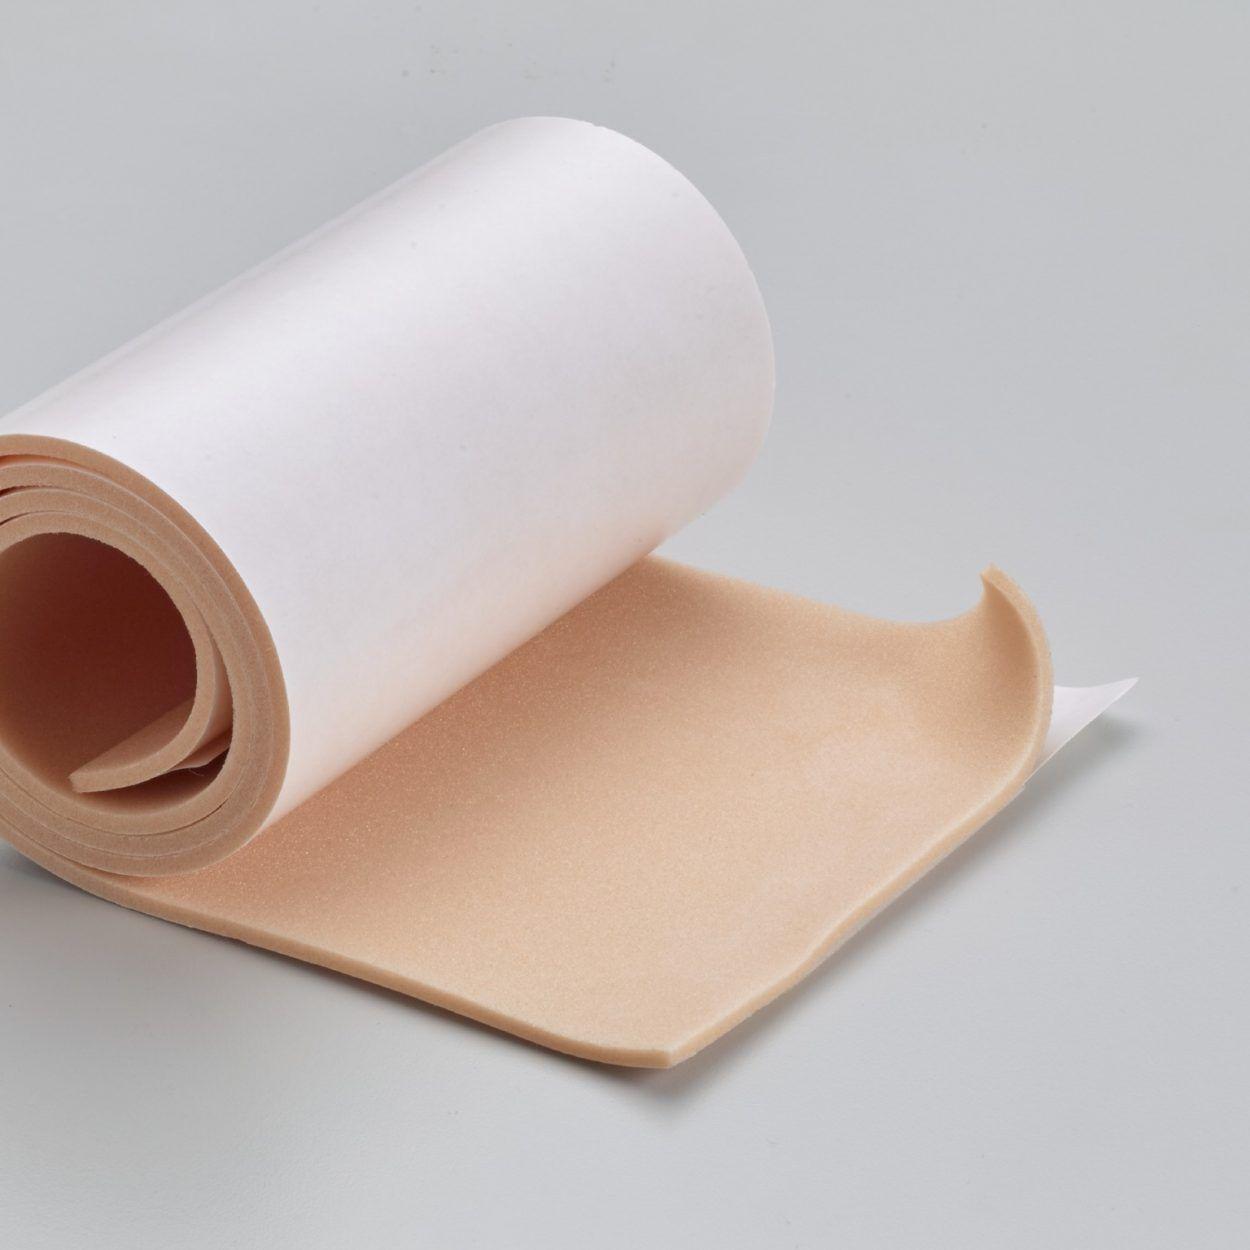 plastazote foam padding